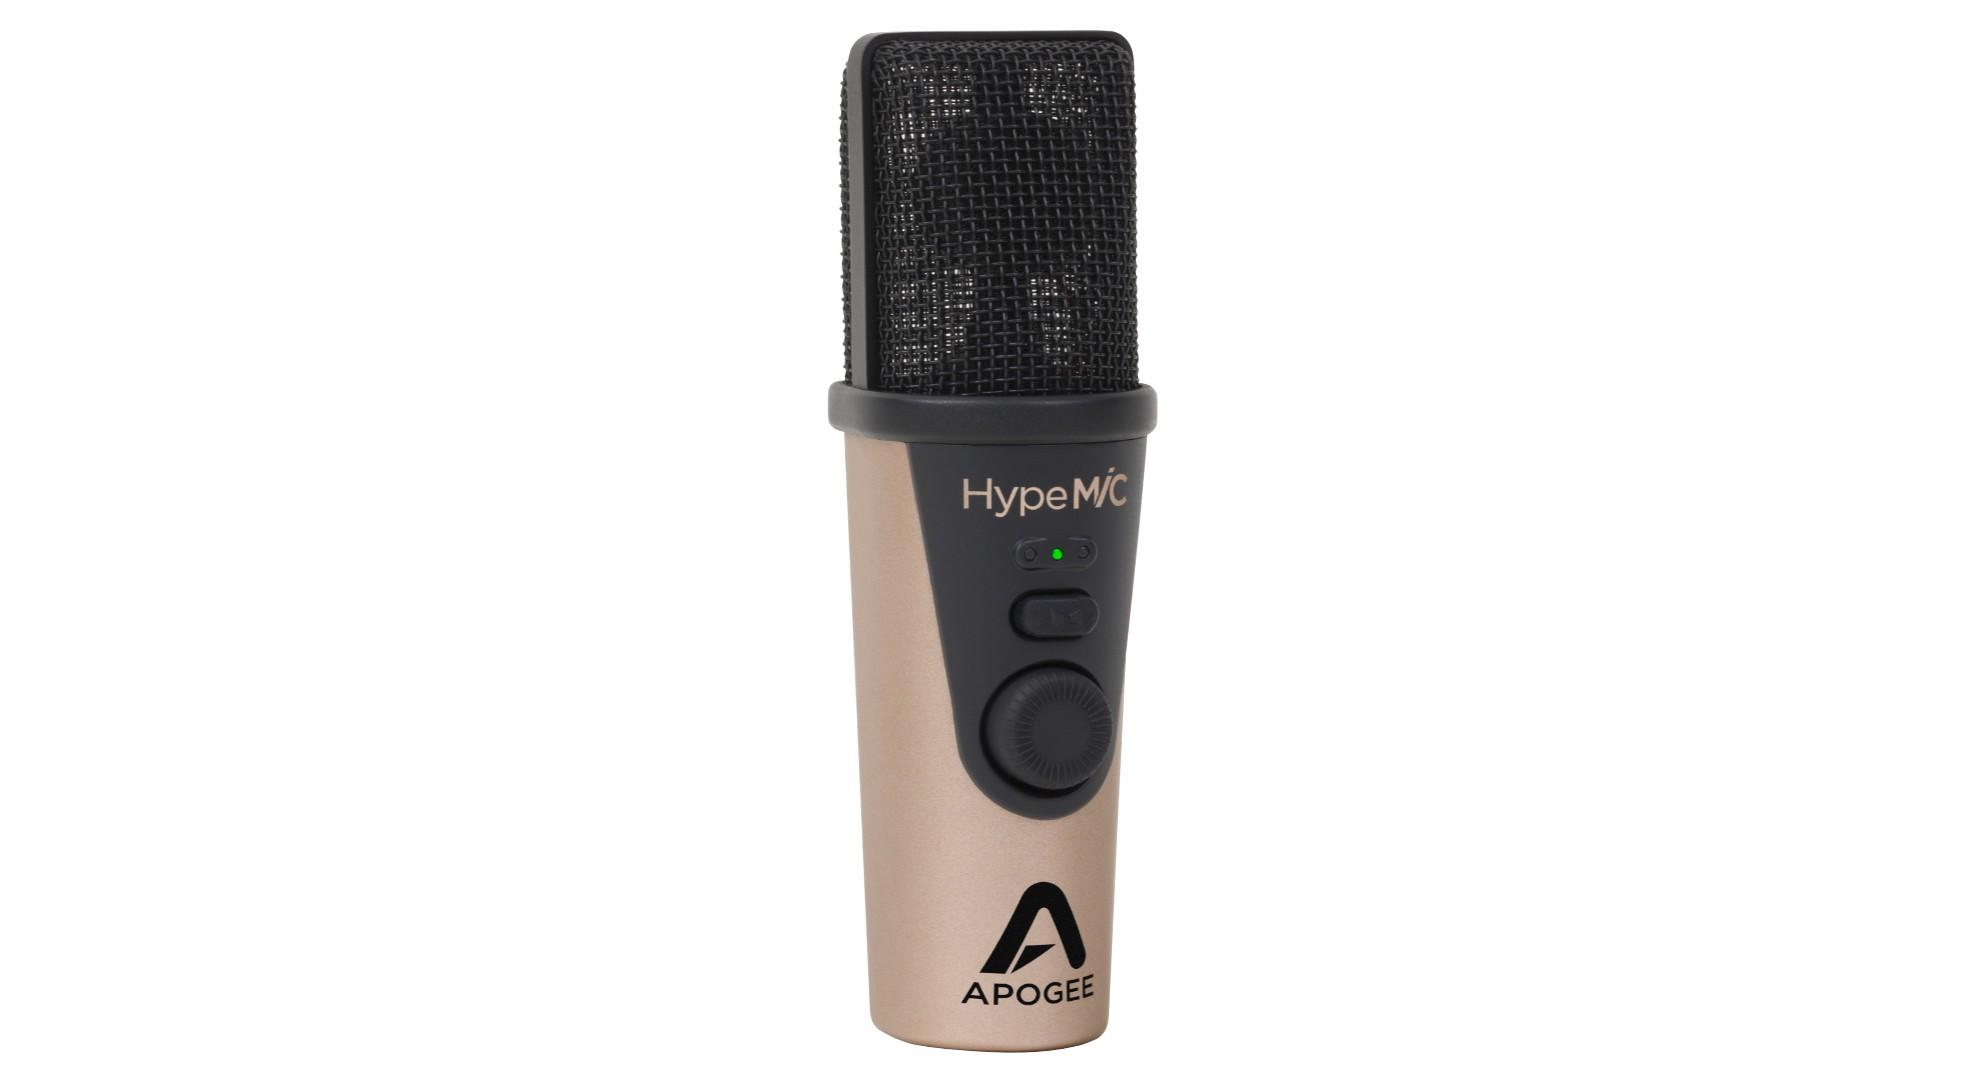 Apogee HypeMiC Angled Right.jpg